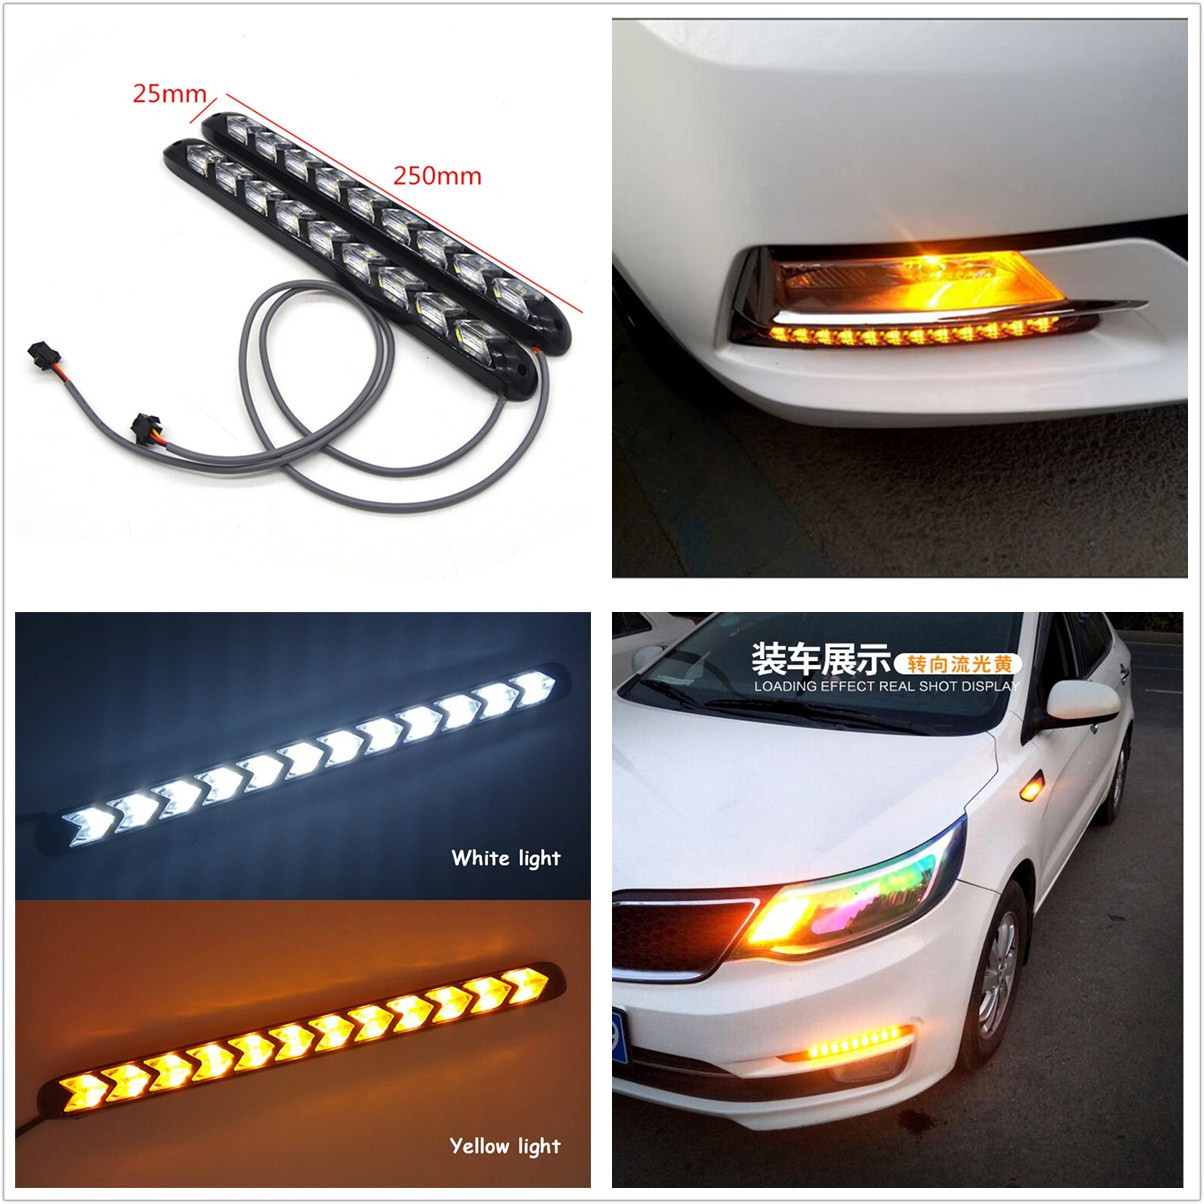 Amber LED Strip Drl Run Light 250mm New 2x Headlight Switchback White